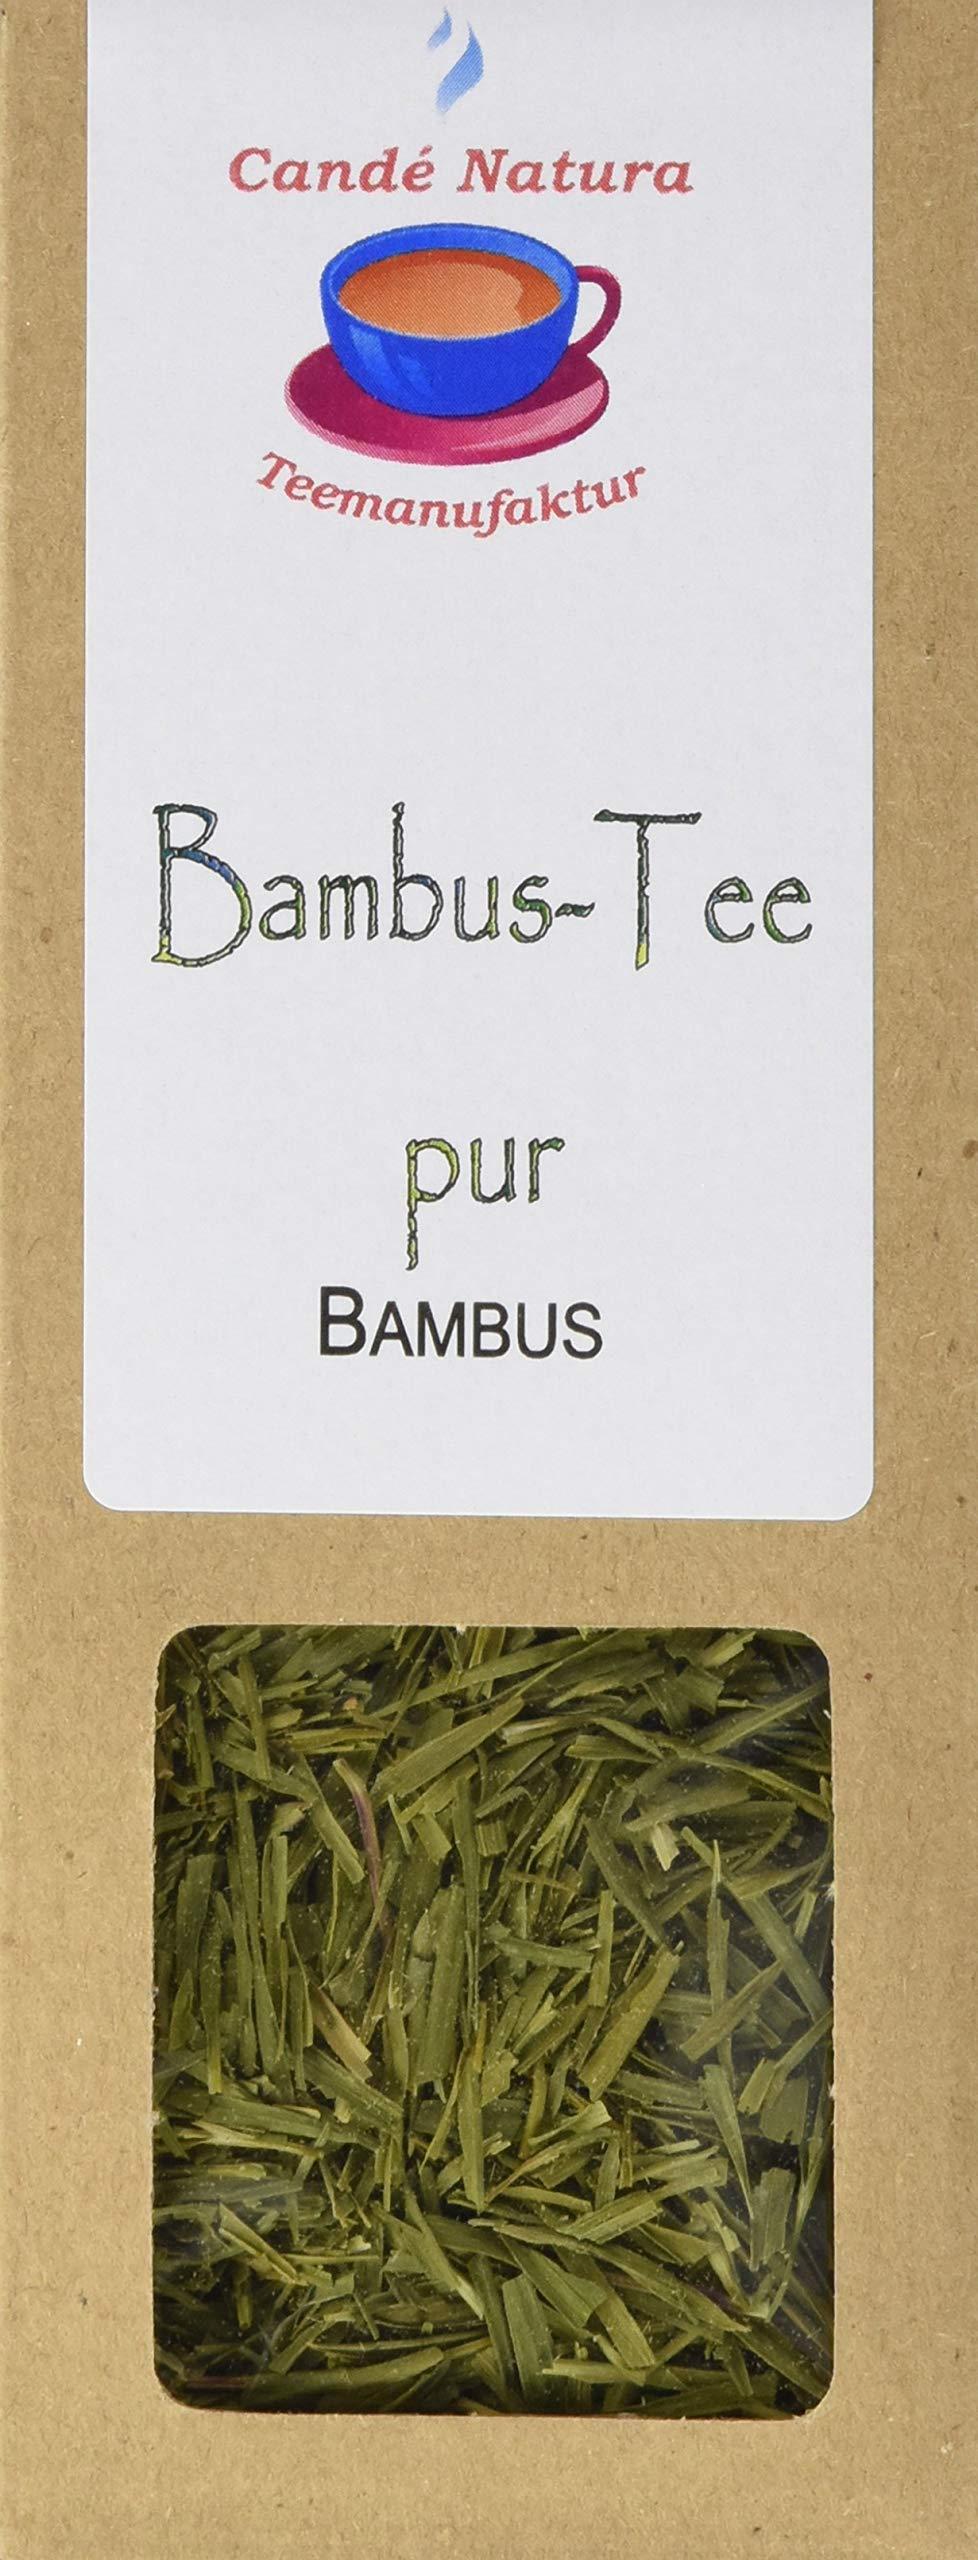 Cand-Natura-Teemanufaktur-Bambusbltter-pur-5er-Pack-5-x-25g